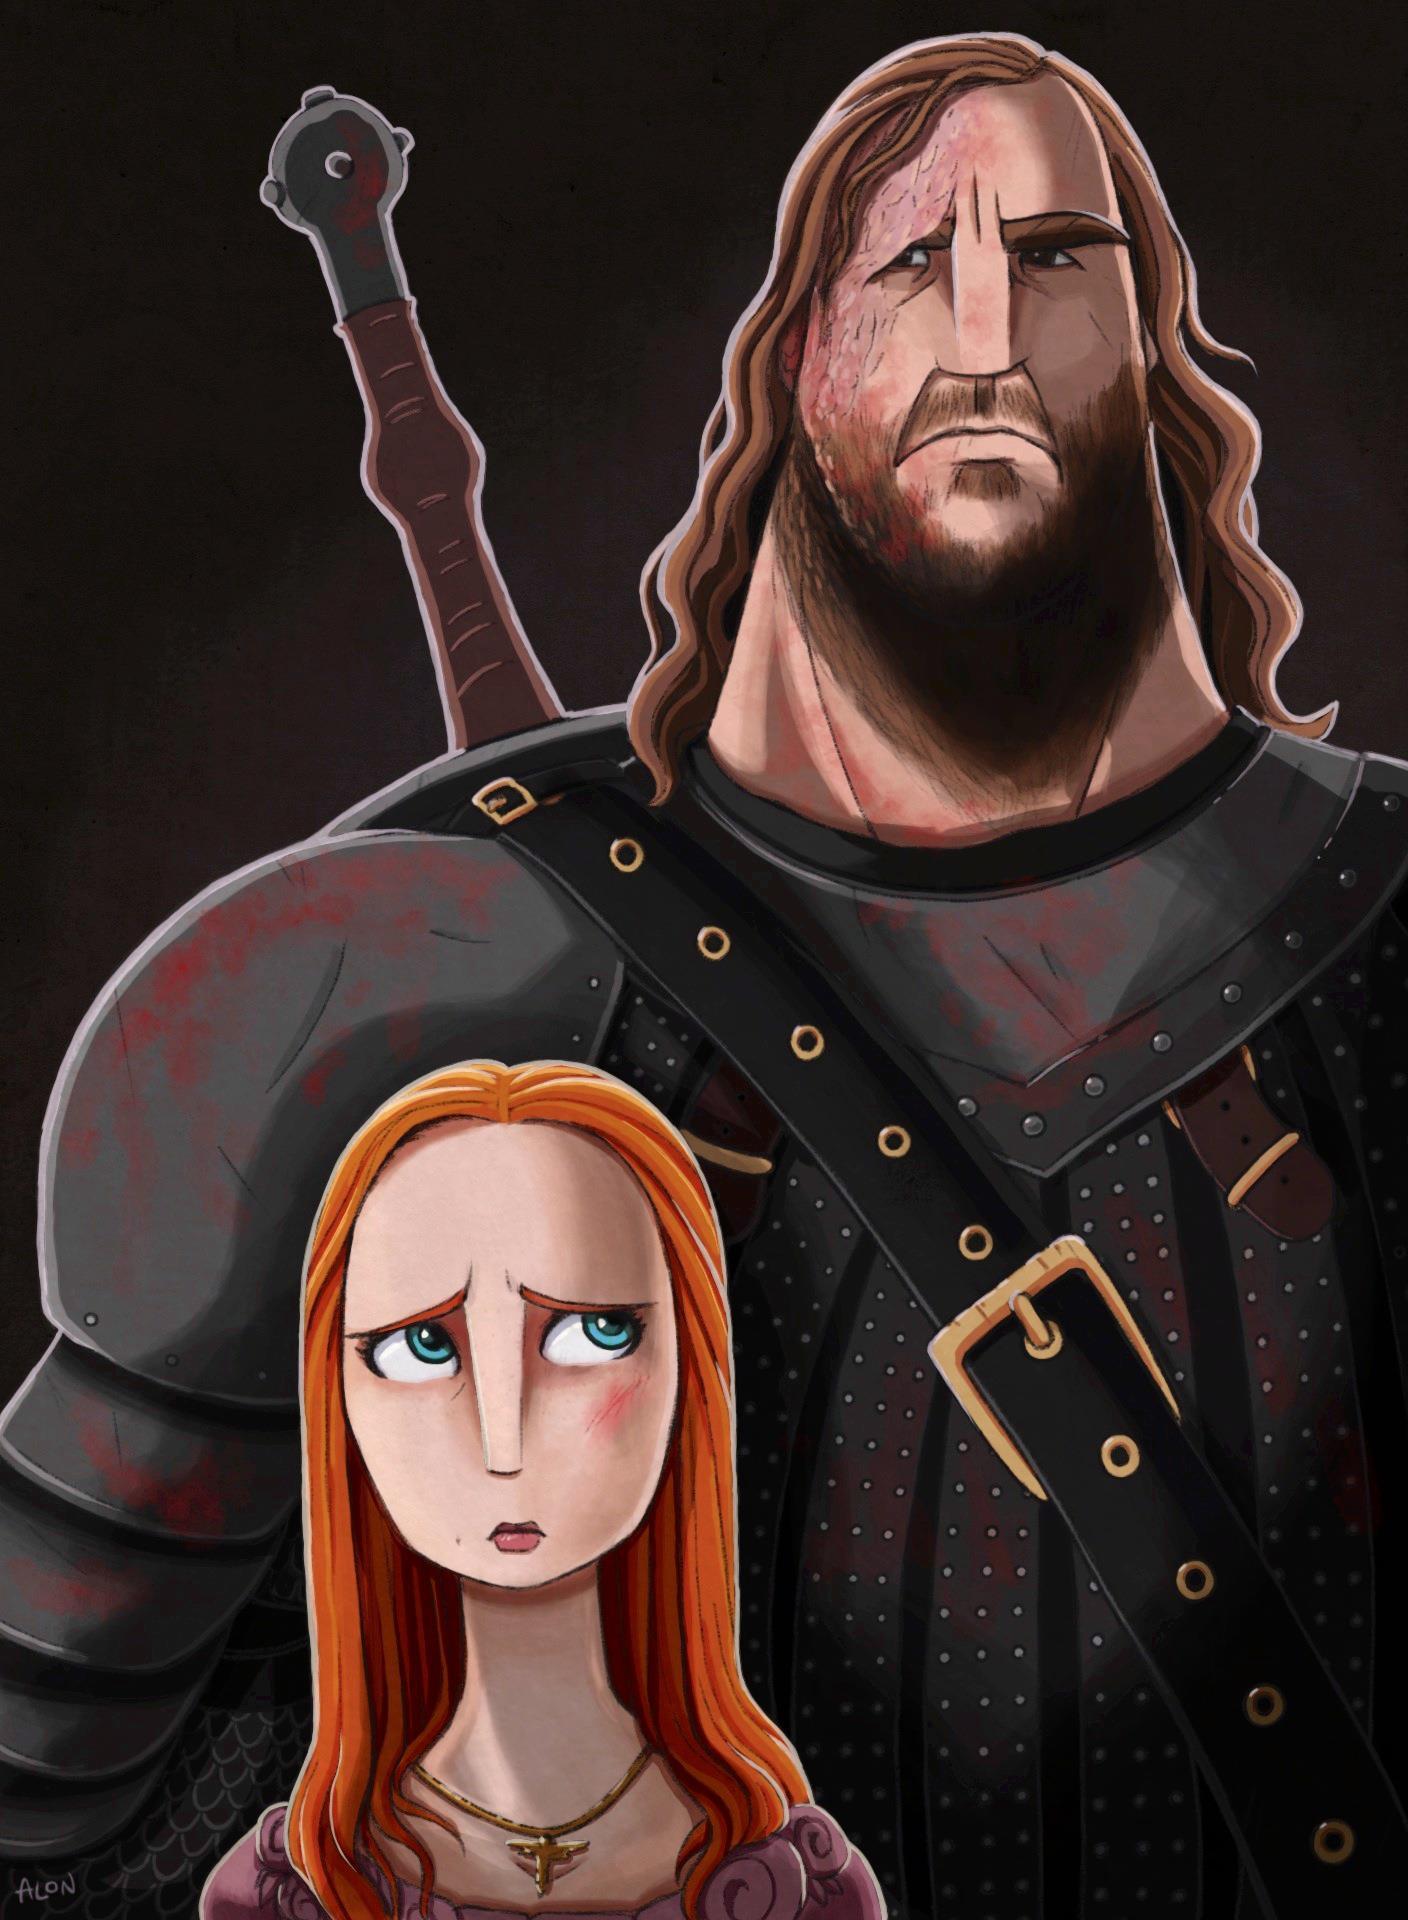 game of thrones artwork - photo #37